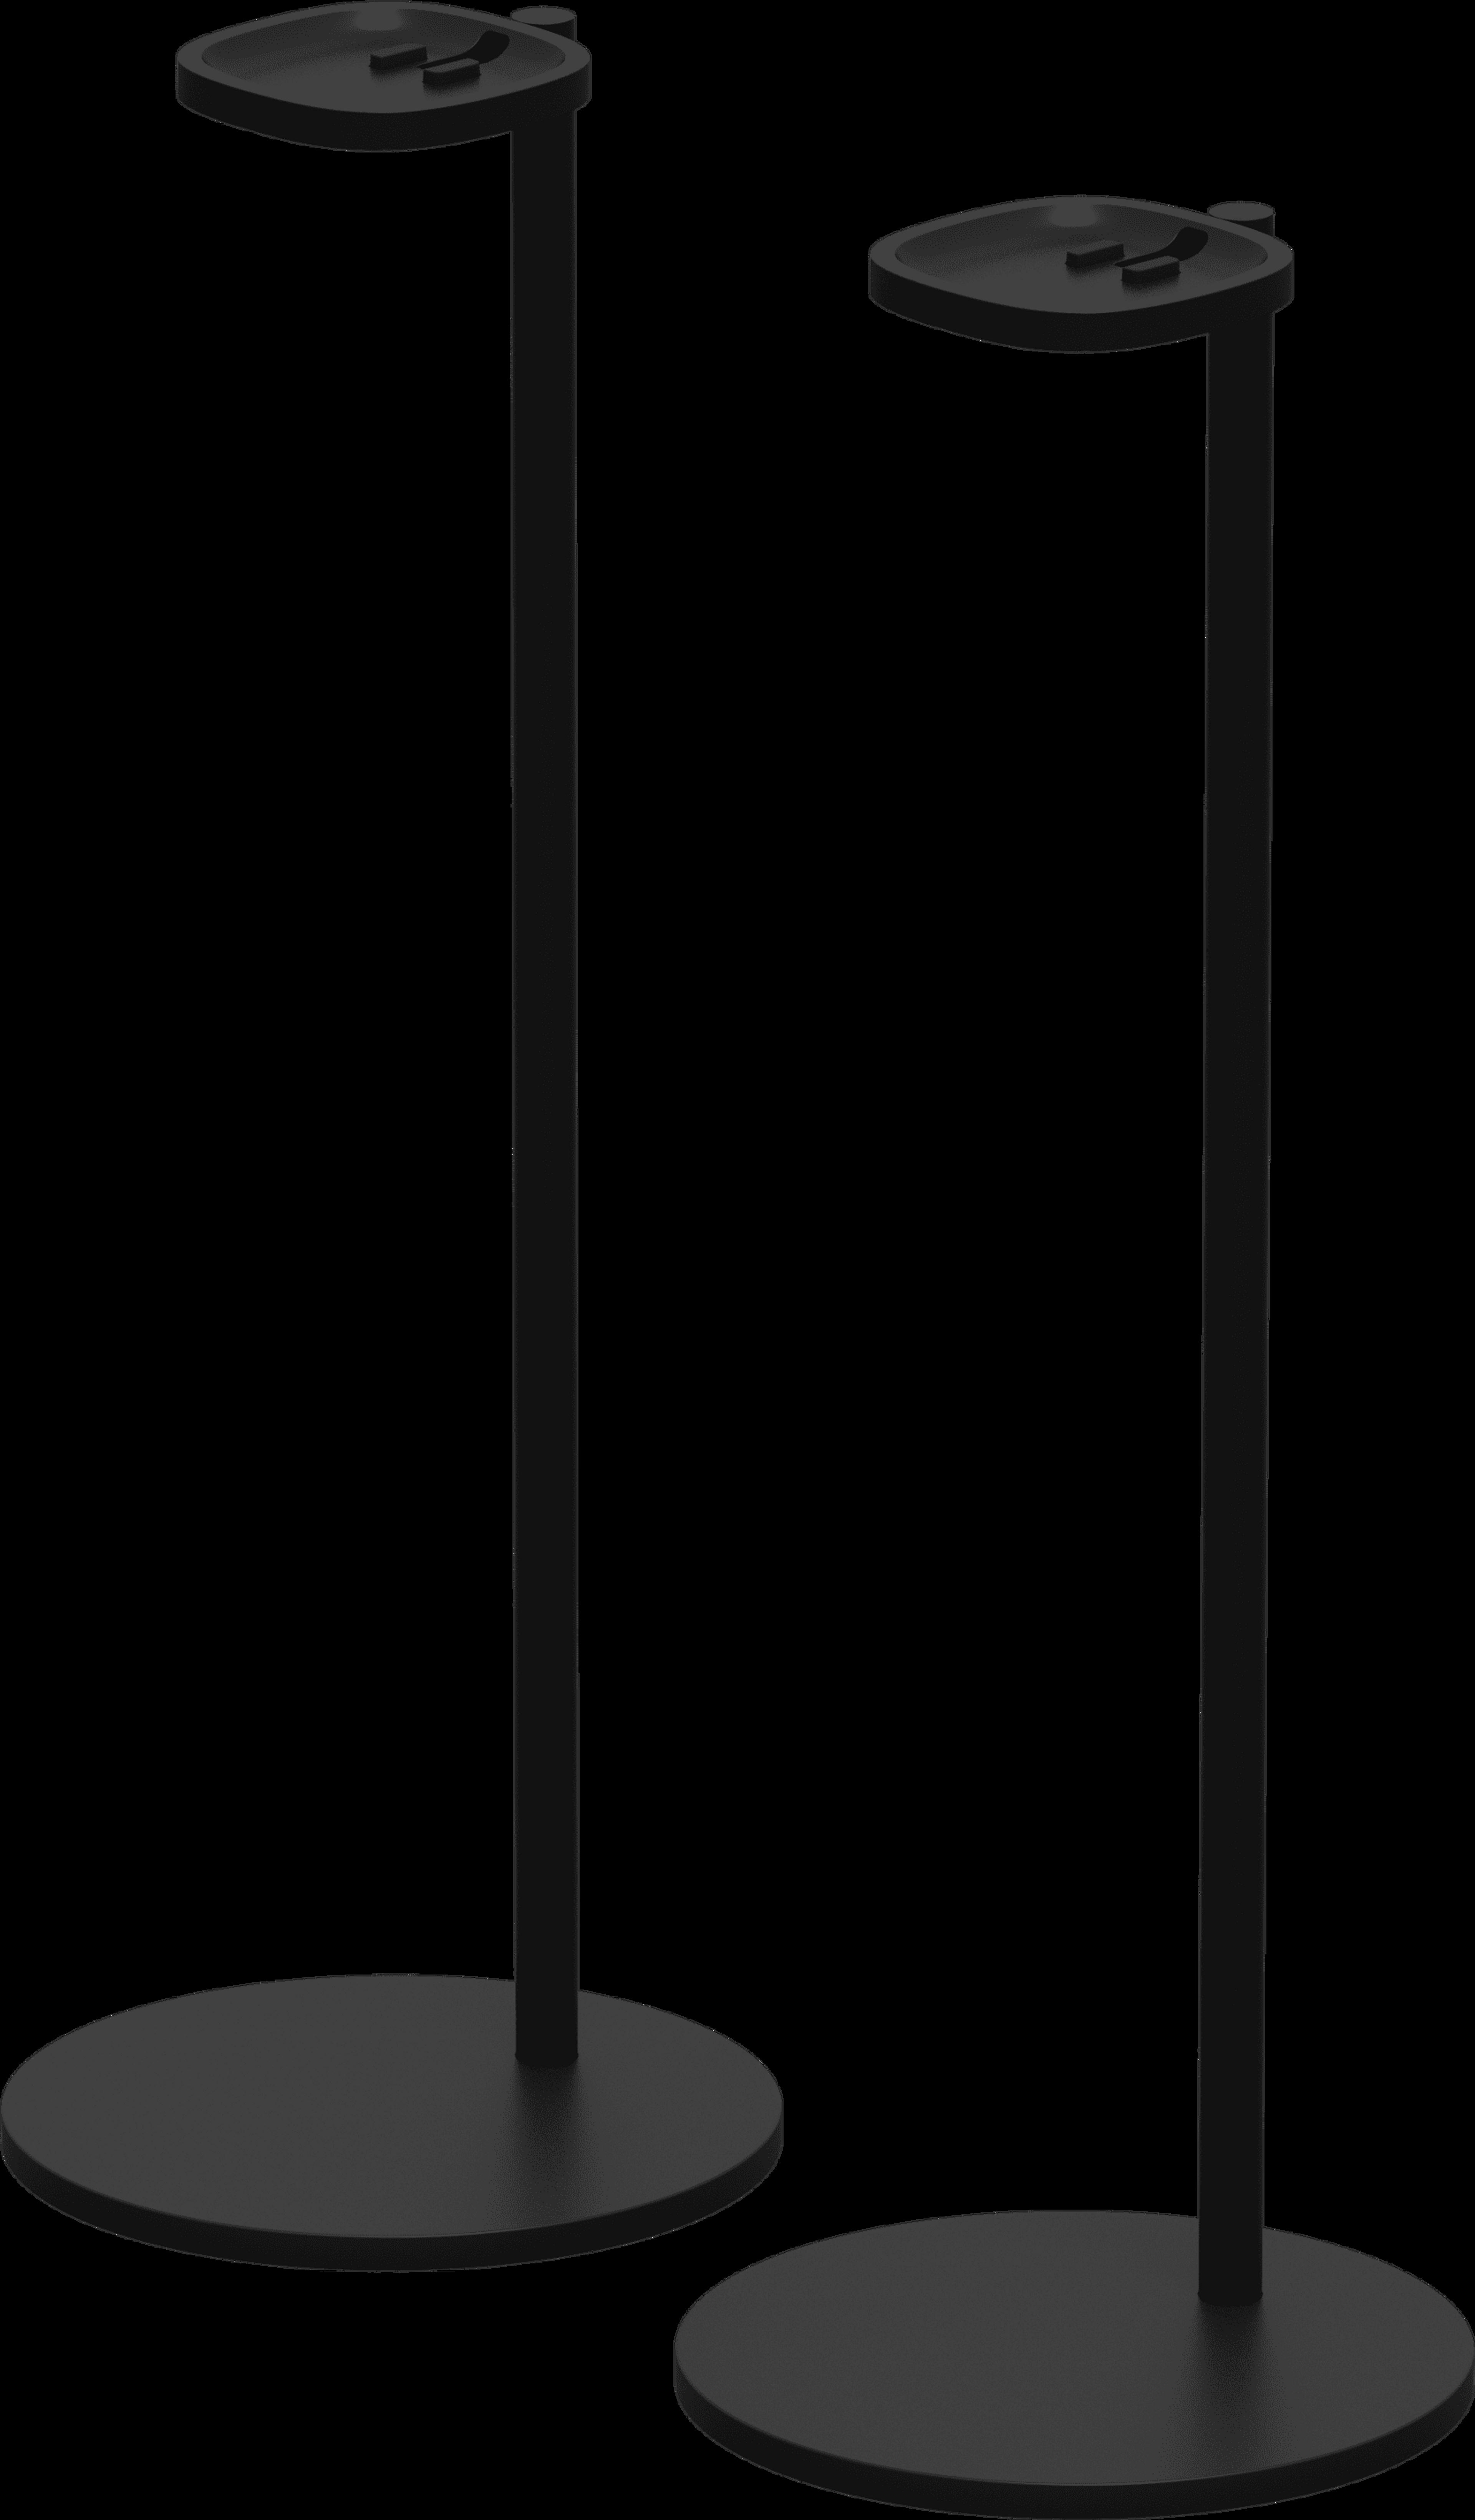 Stand full empty pair black